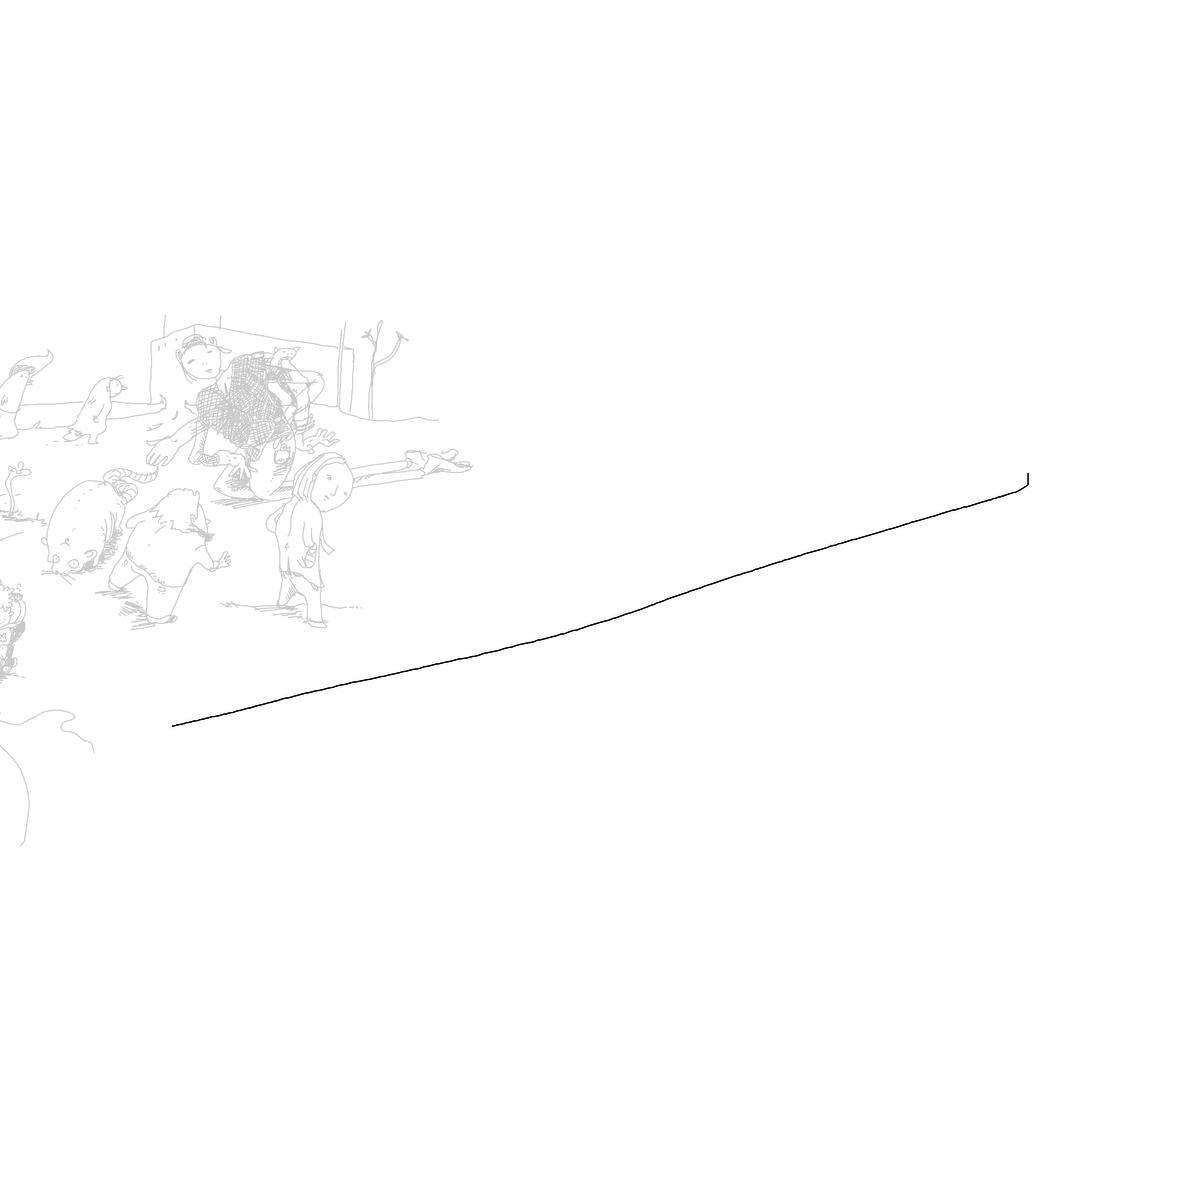 BAAAM drawing#4975 lat:78.7422485351562500lng: -18.1122169494628900